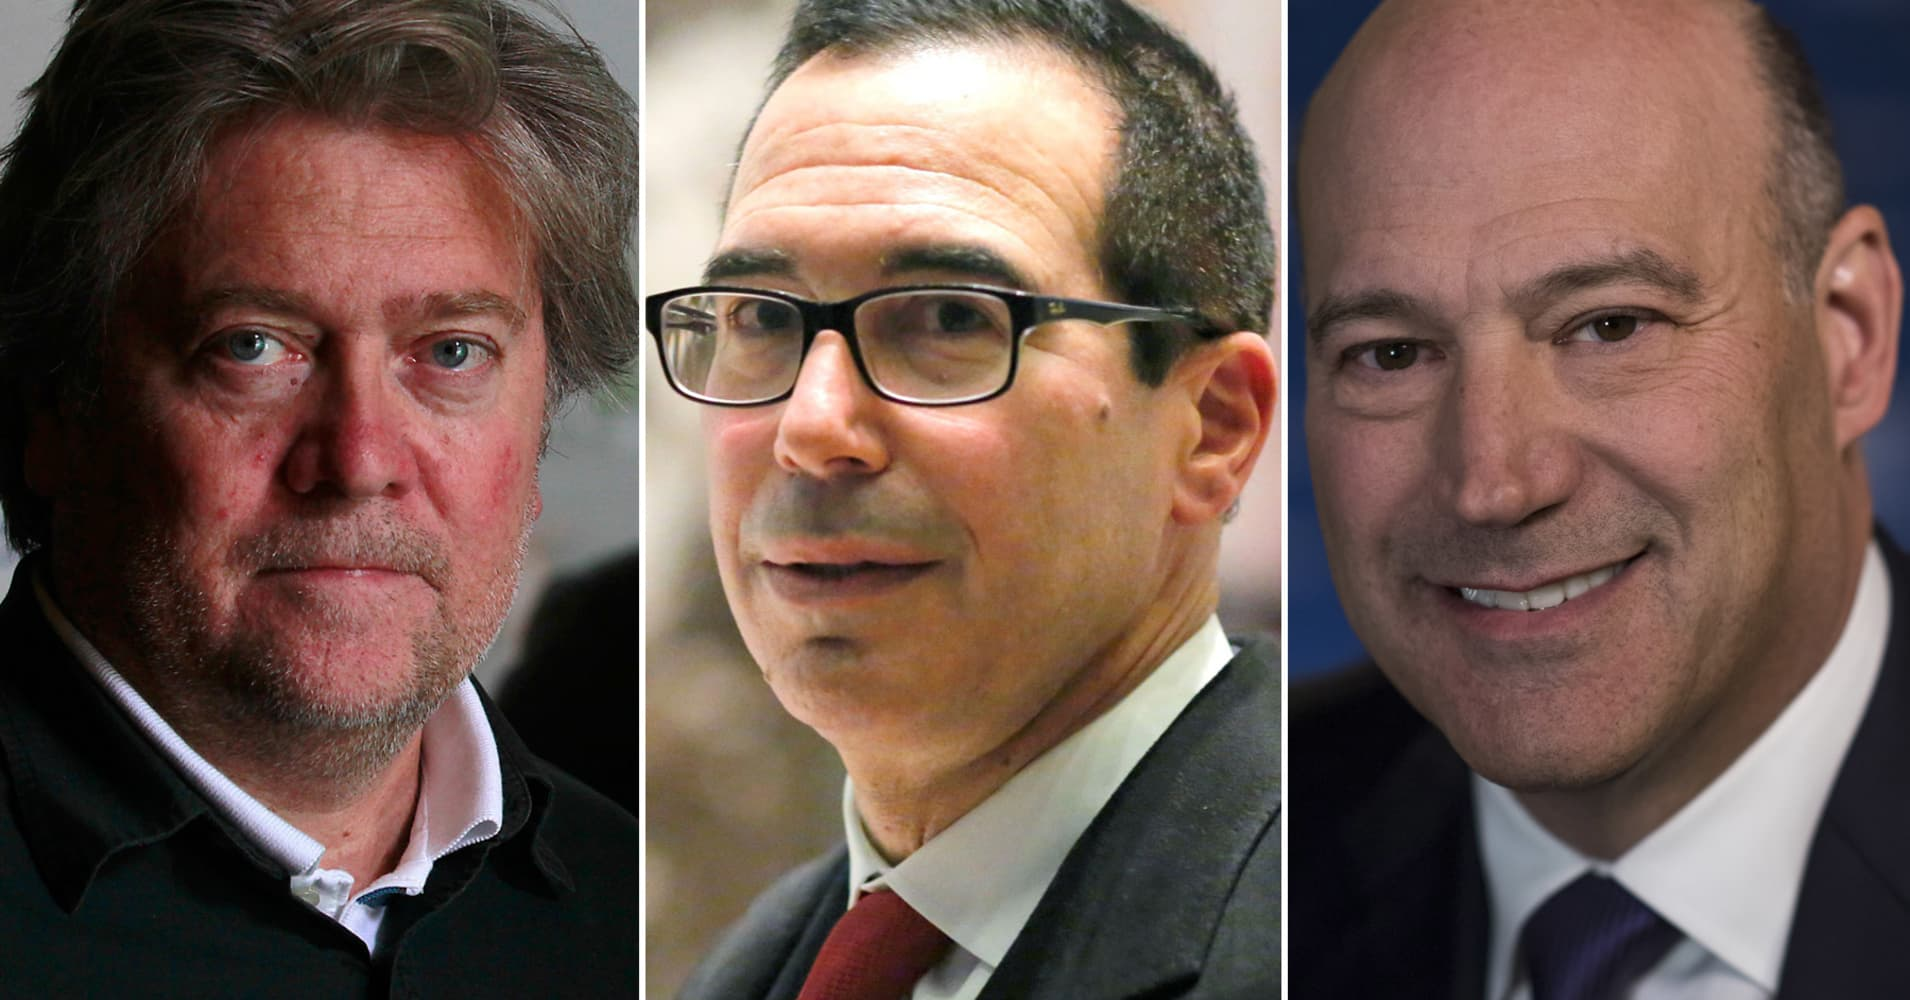 Wall Street basher Trump loving Goldman guys for his team